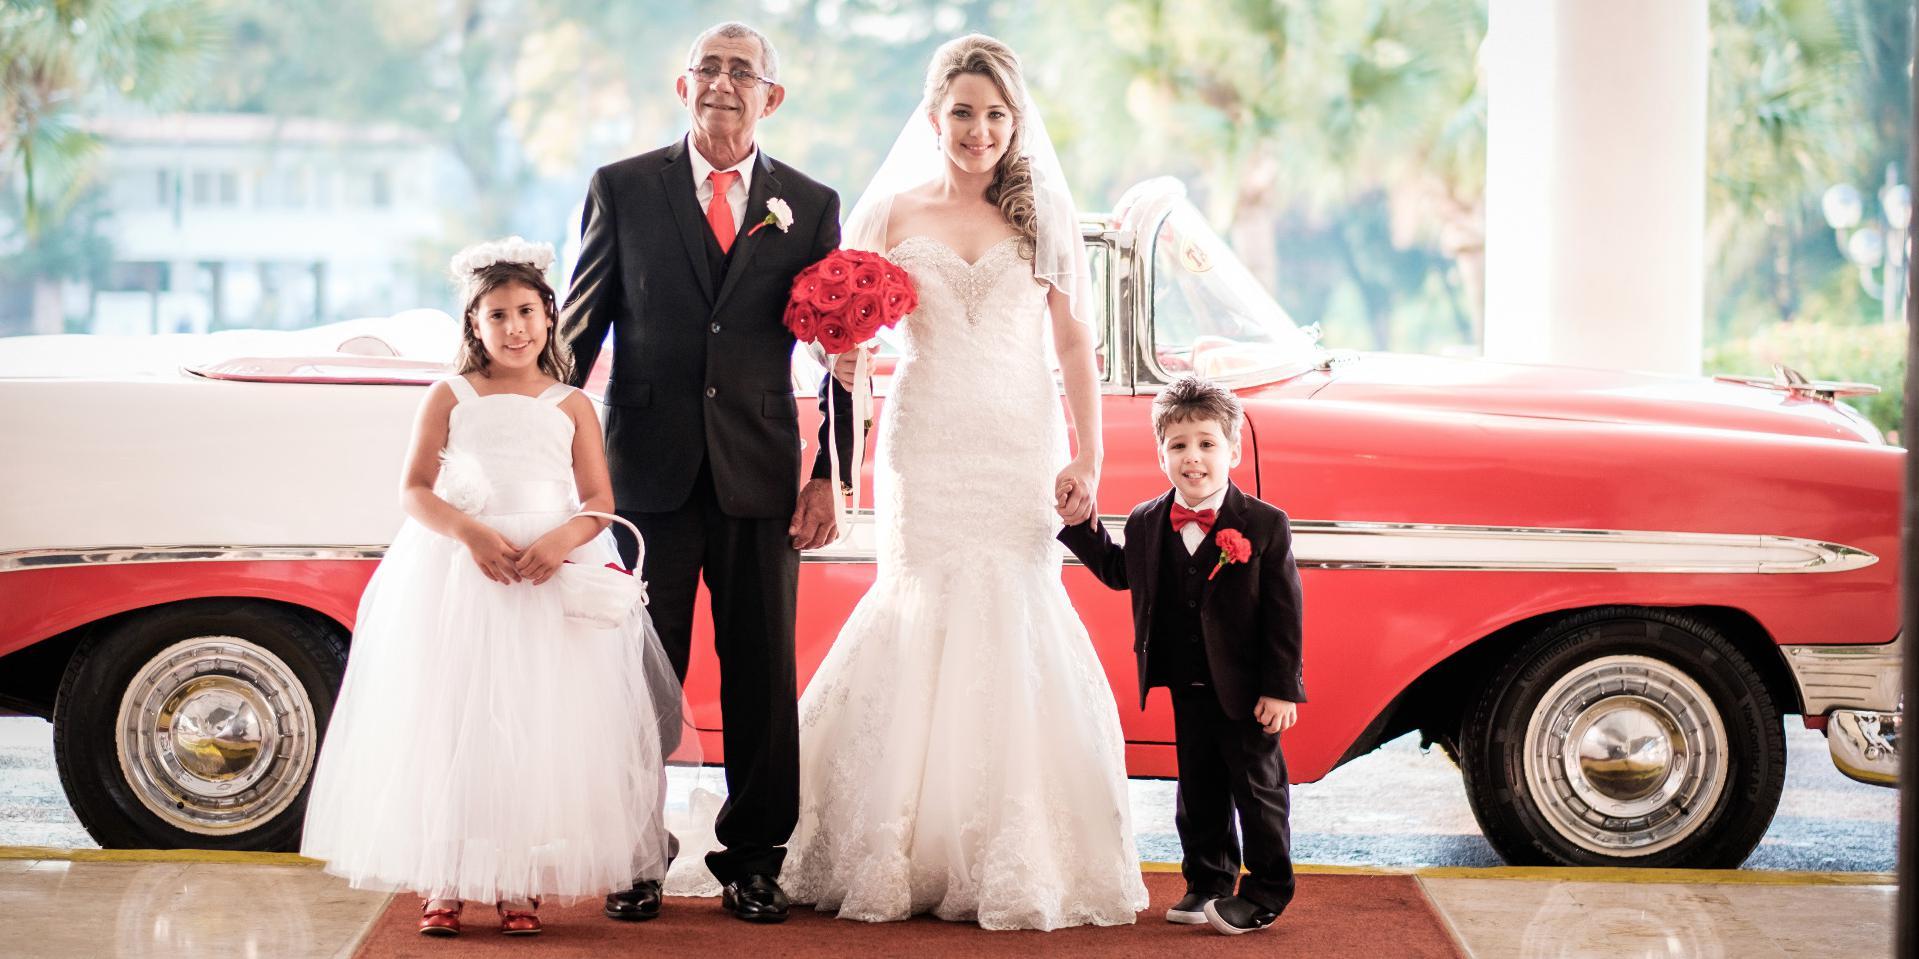 bodas-sin-clasificar-sin-tema-cuba-28131.jpg